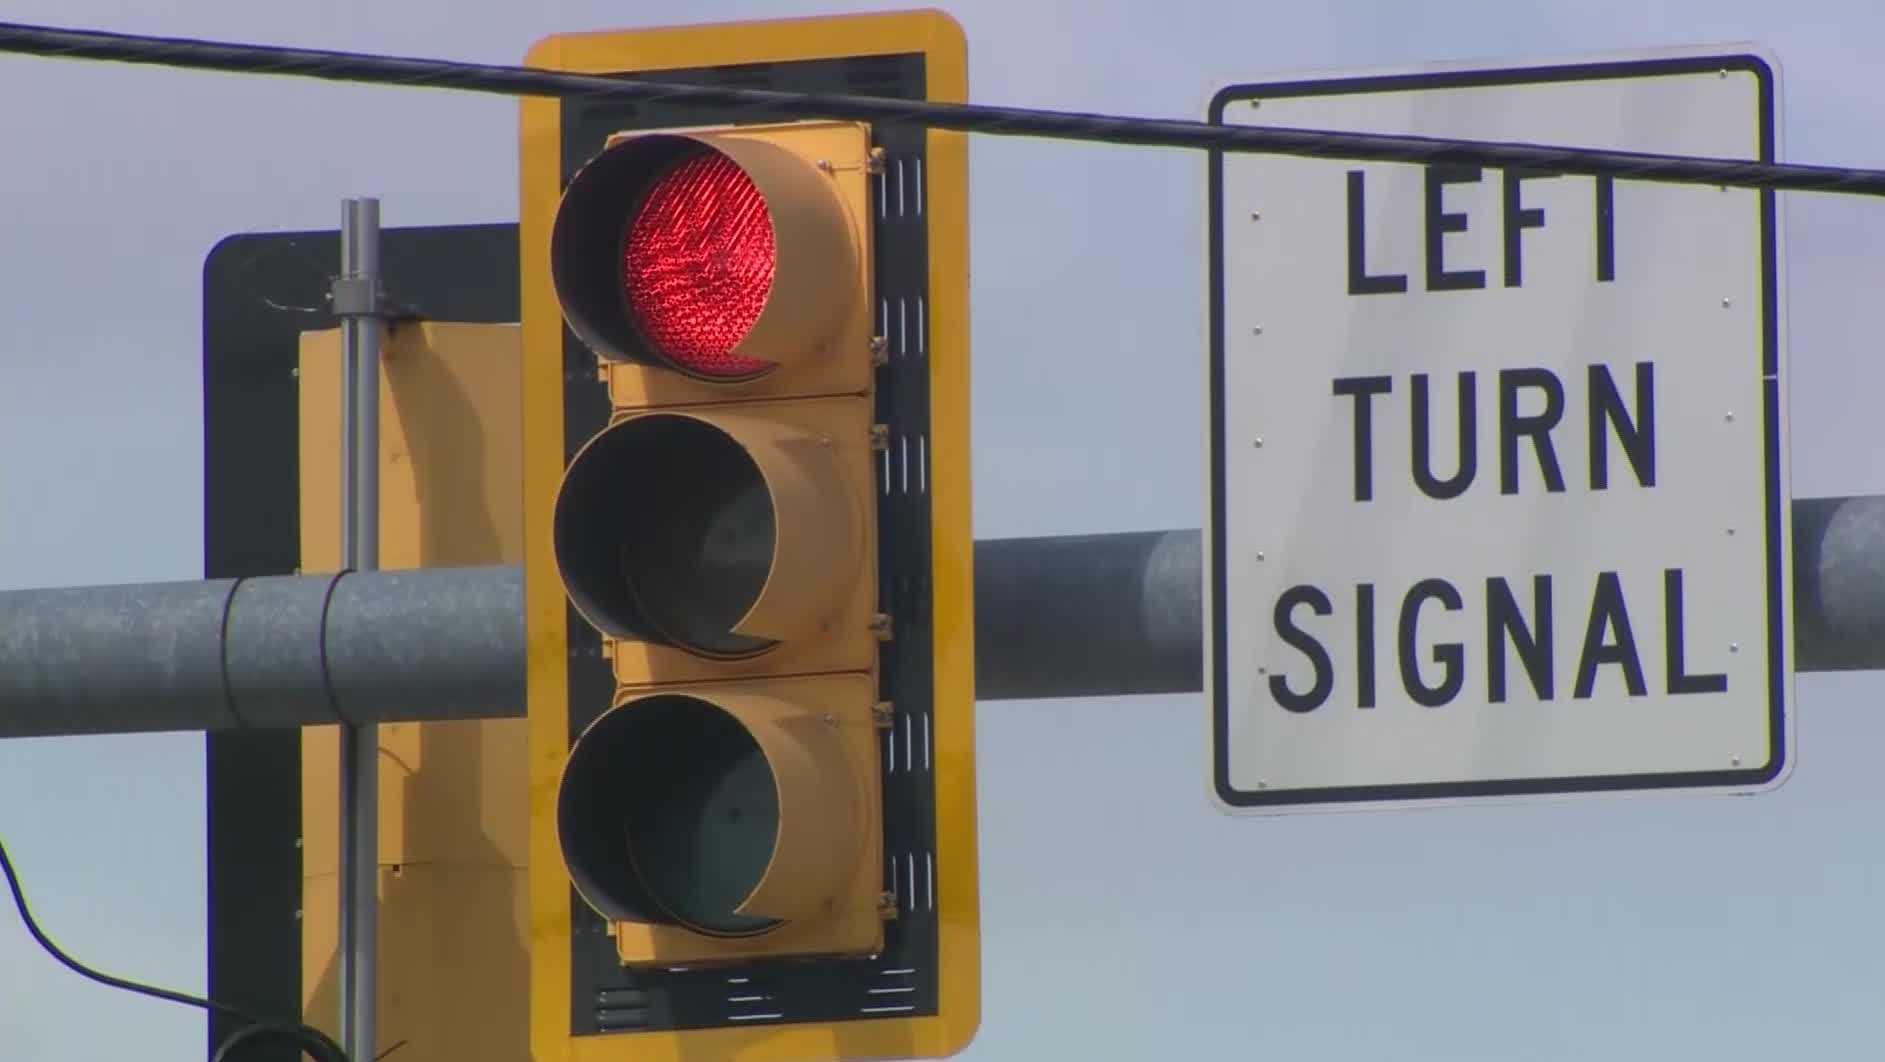 Traffic light, red light, left turn signal